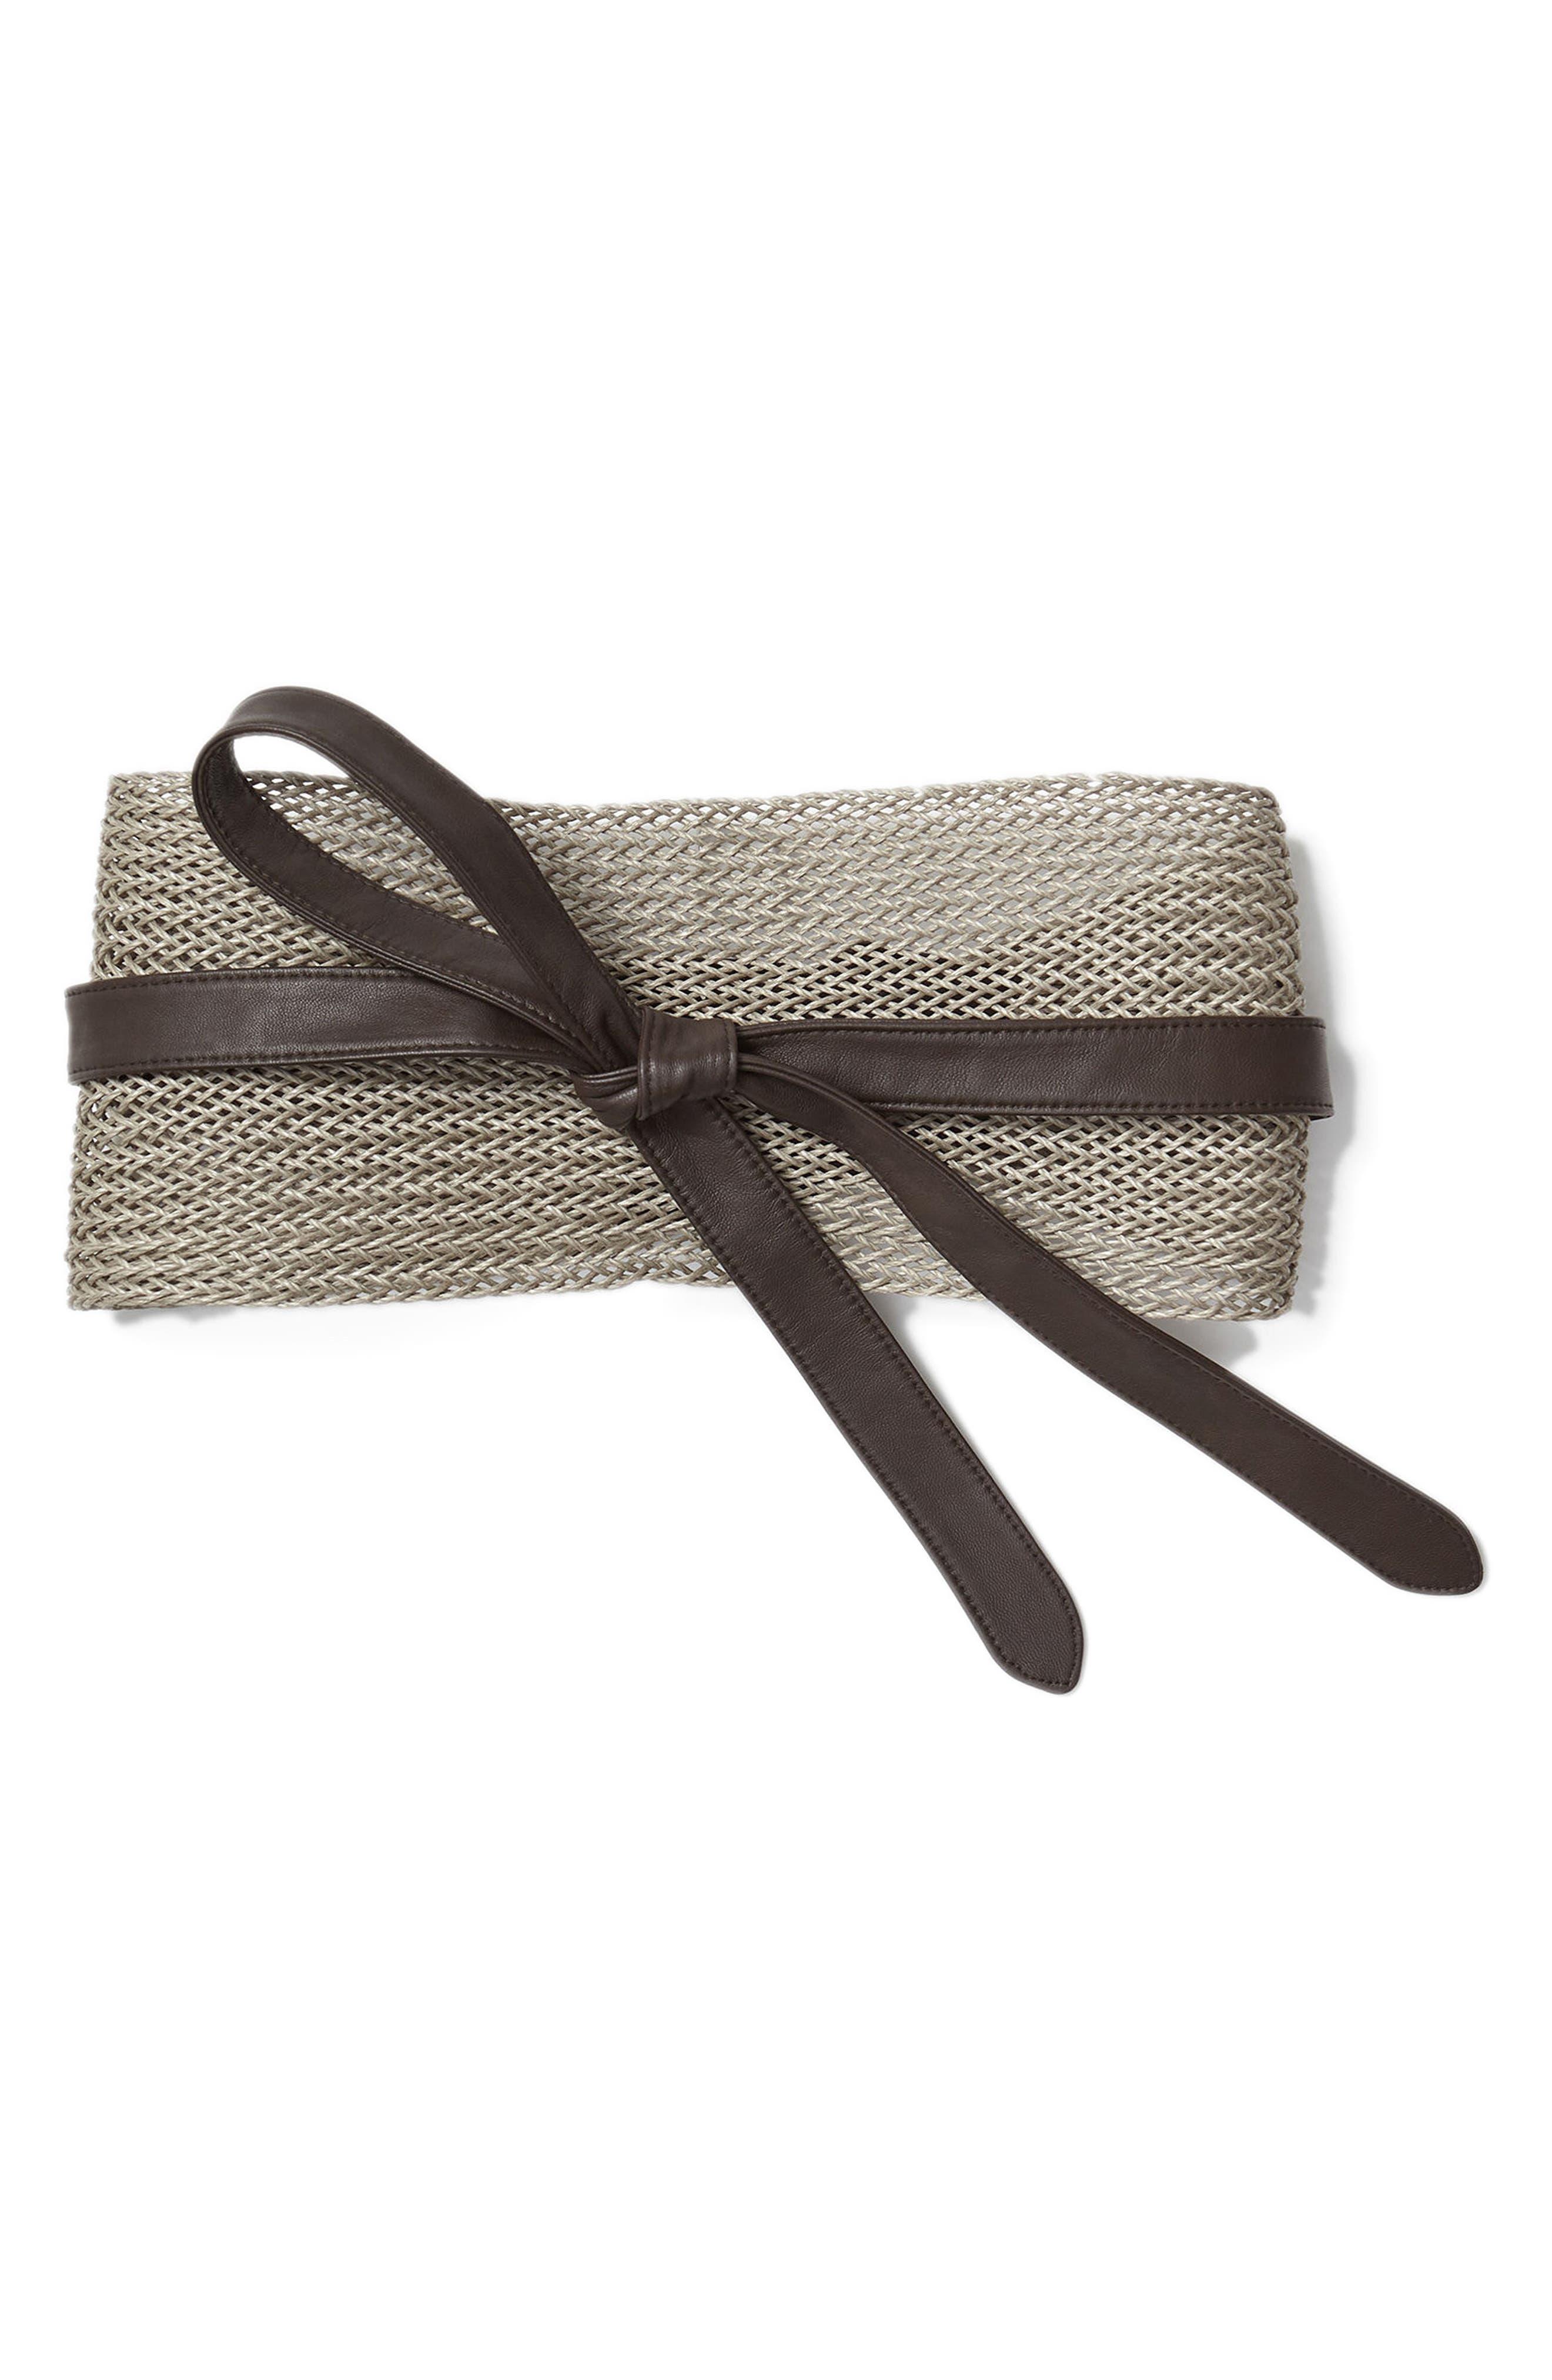 Obi Linen & Leather Belt,                         Main,                         color, NIGHTINGALE